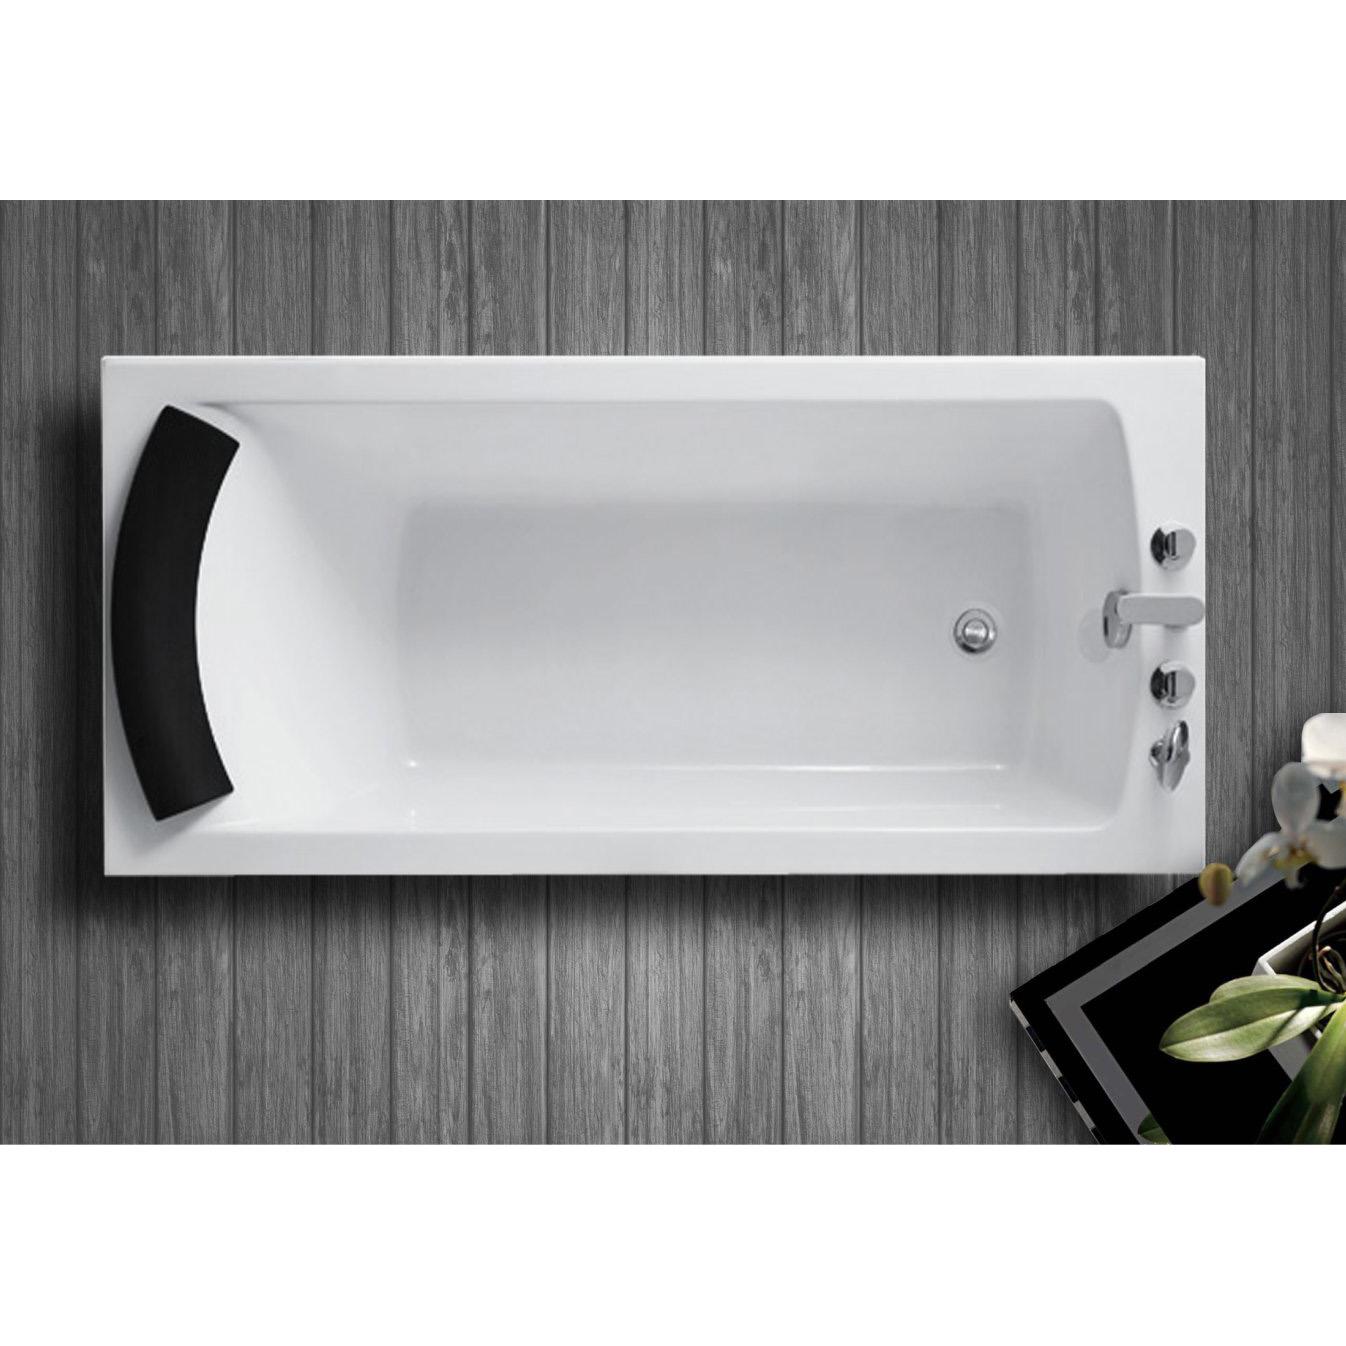 Акриловая ванна Royal bath Vienna RB953200 140х70 каркас сварной к ванне royal bath vienna 140 rb953200k